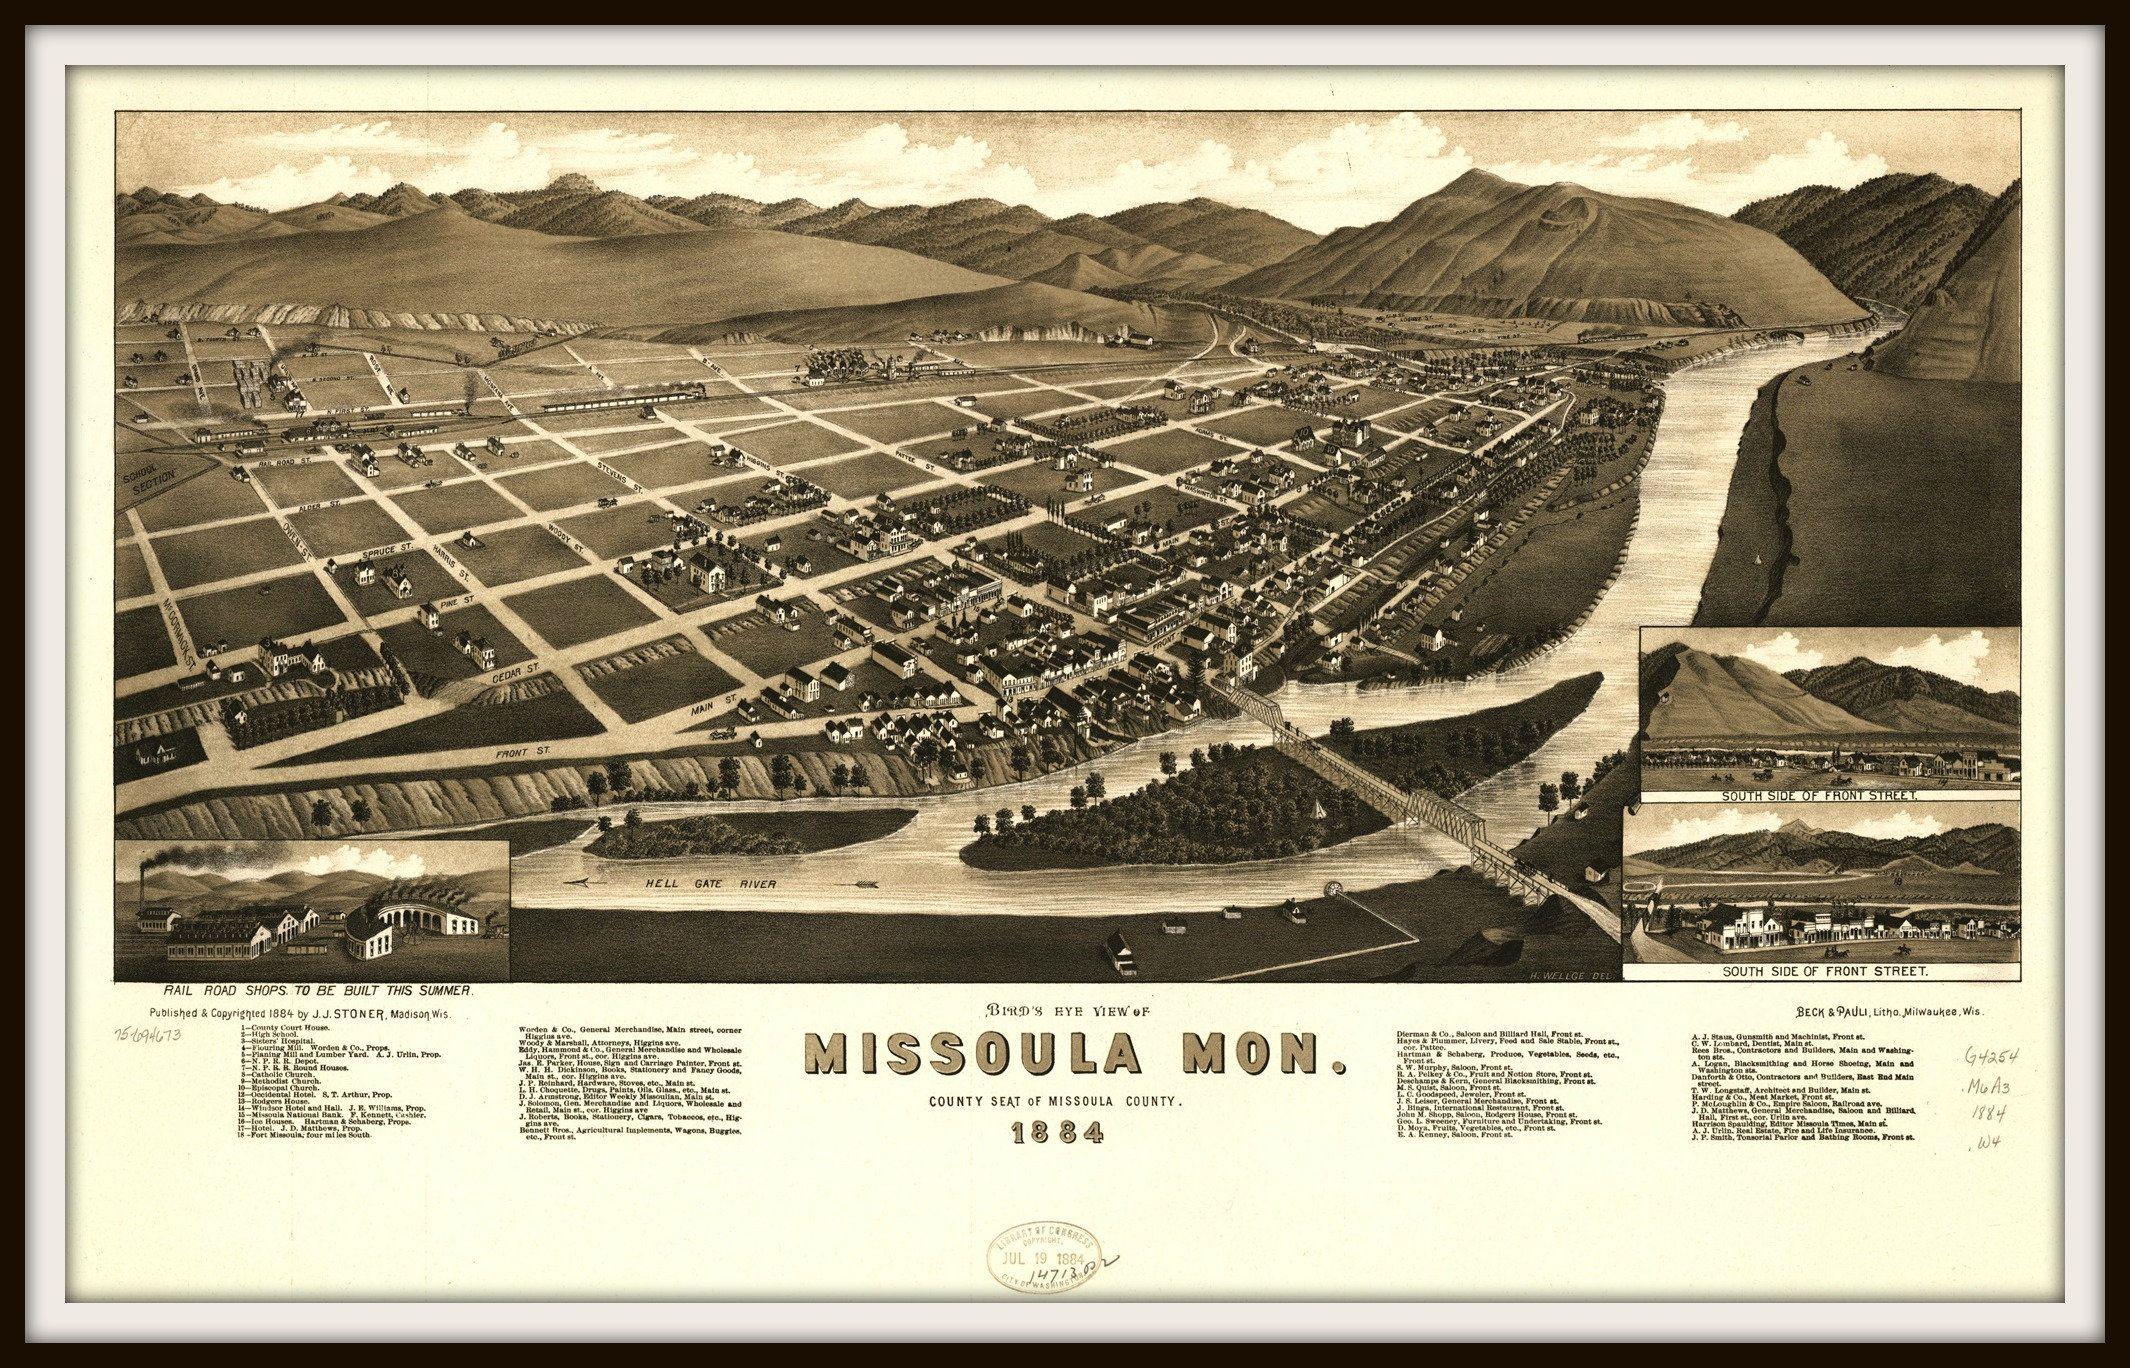 1884 Missoula Montana Vintage Old Panoramic City Map 16x24